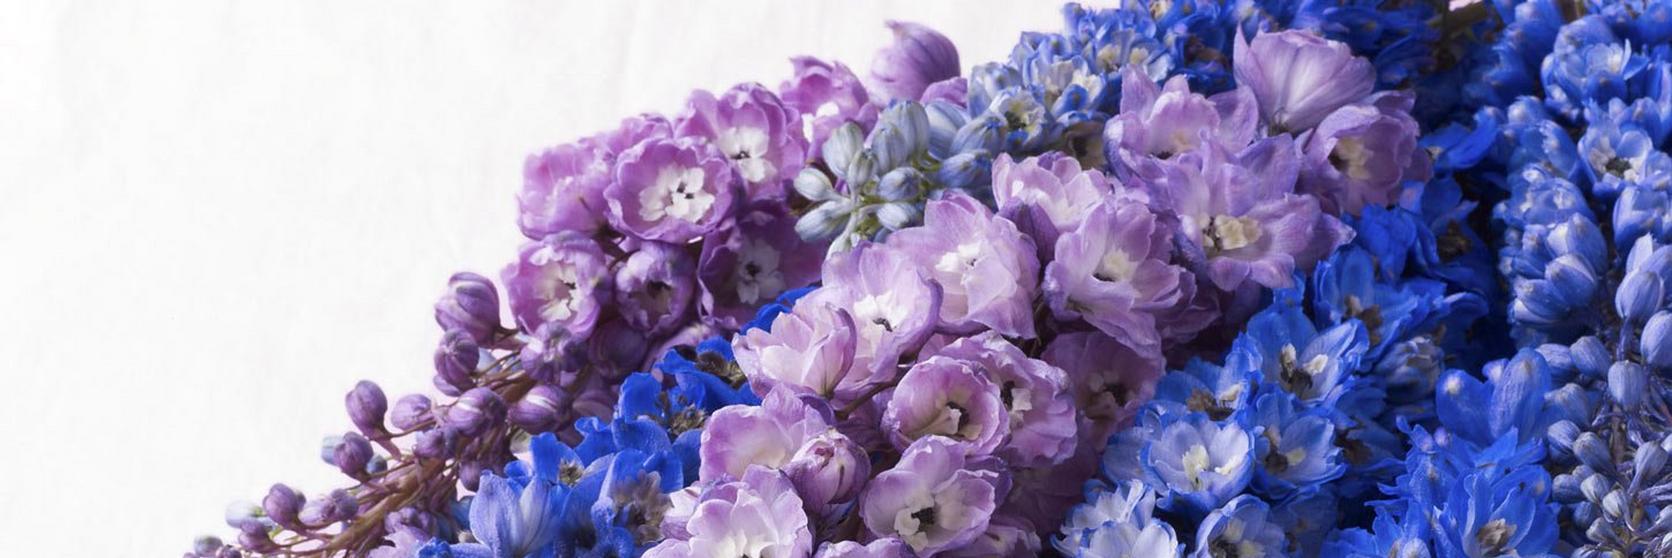 Delphinium-header-ultimate-flower-guide